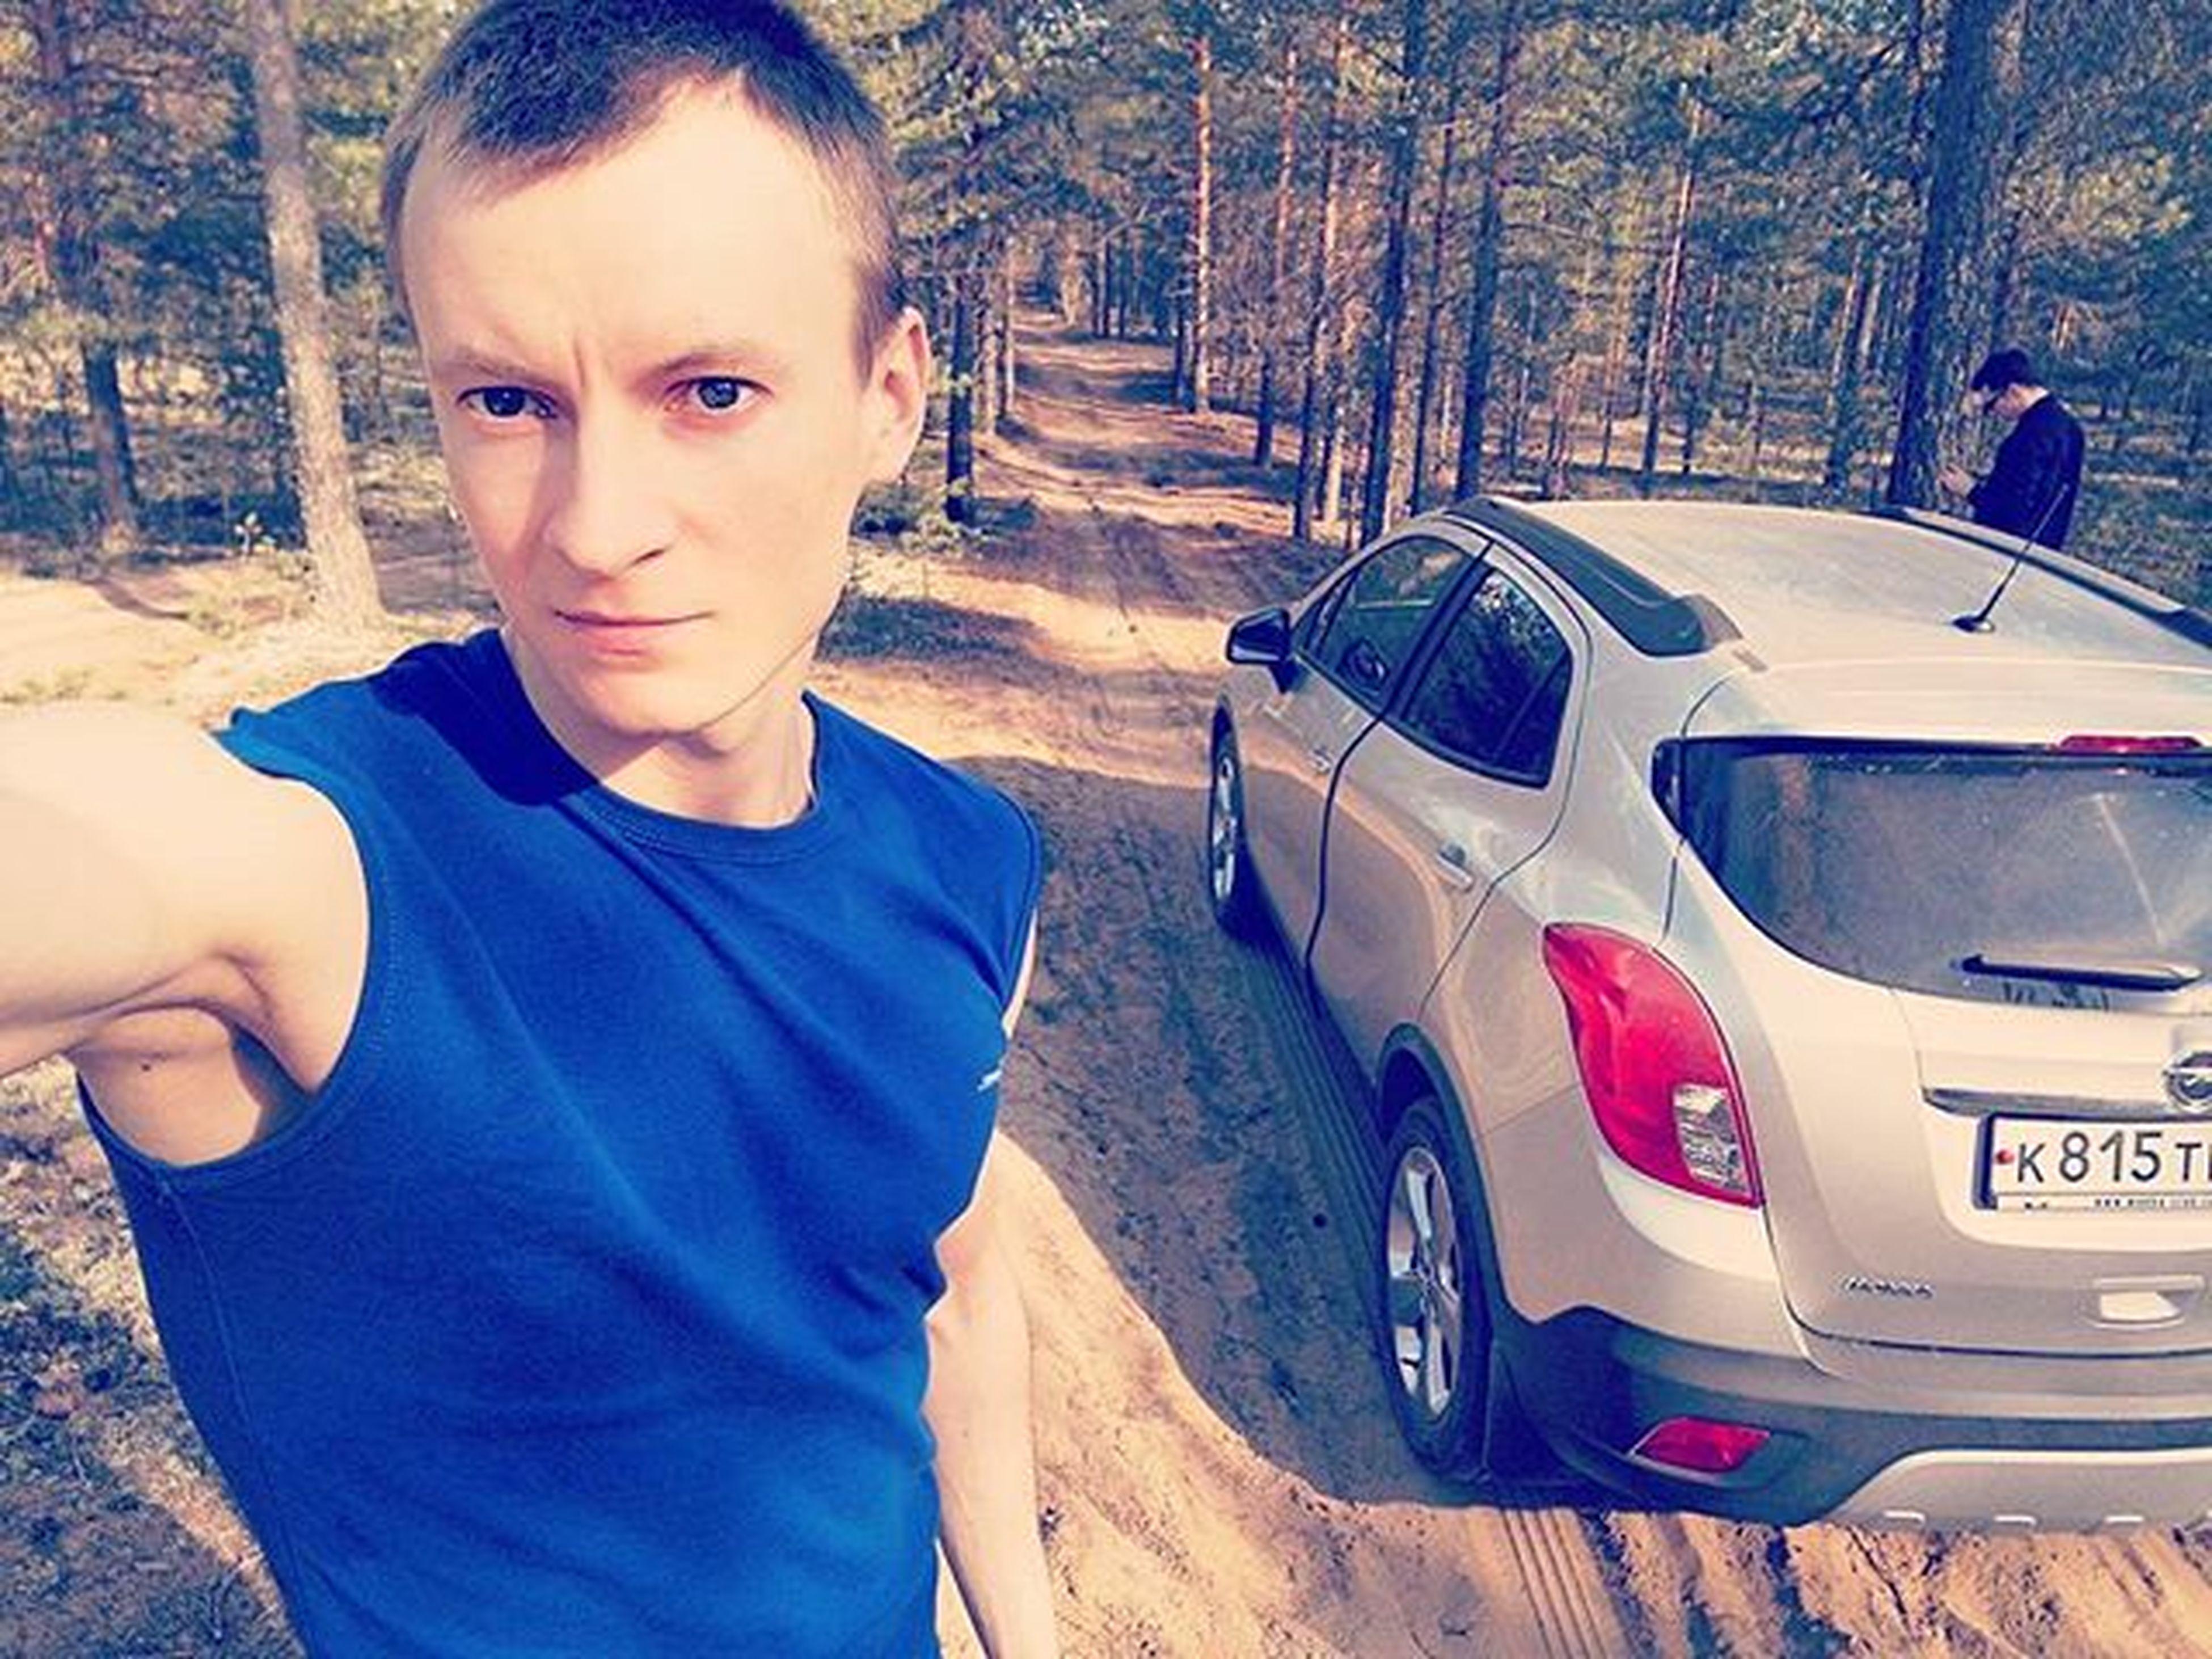 покатушки прогулка весна Авто мы селфи Дорога Лес Opelmokkax Mokka Opel Autos Car Honor7 Huaweihonor7 We Spring Cool Warm Road Selfie Lifestyle Guys